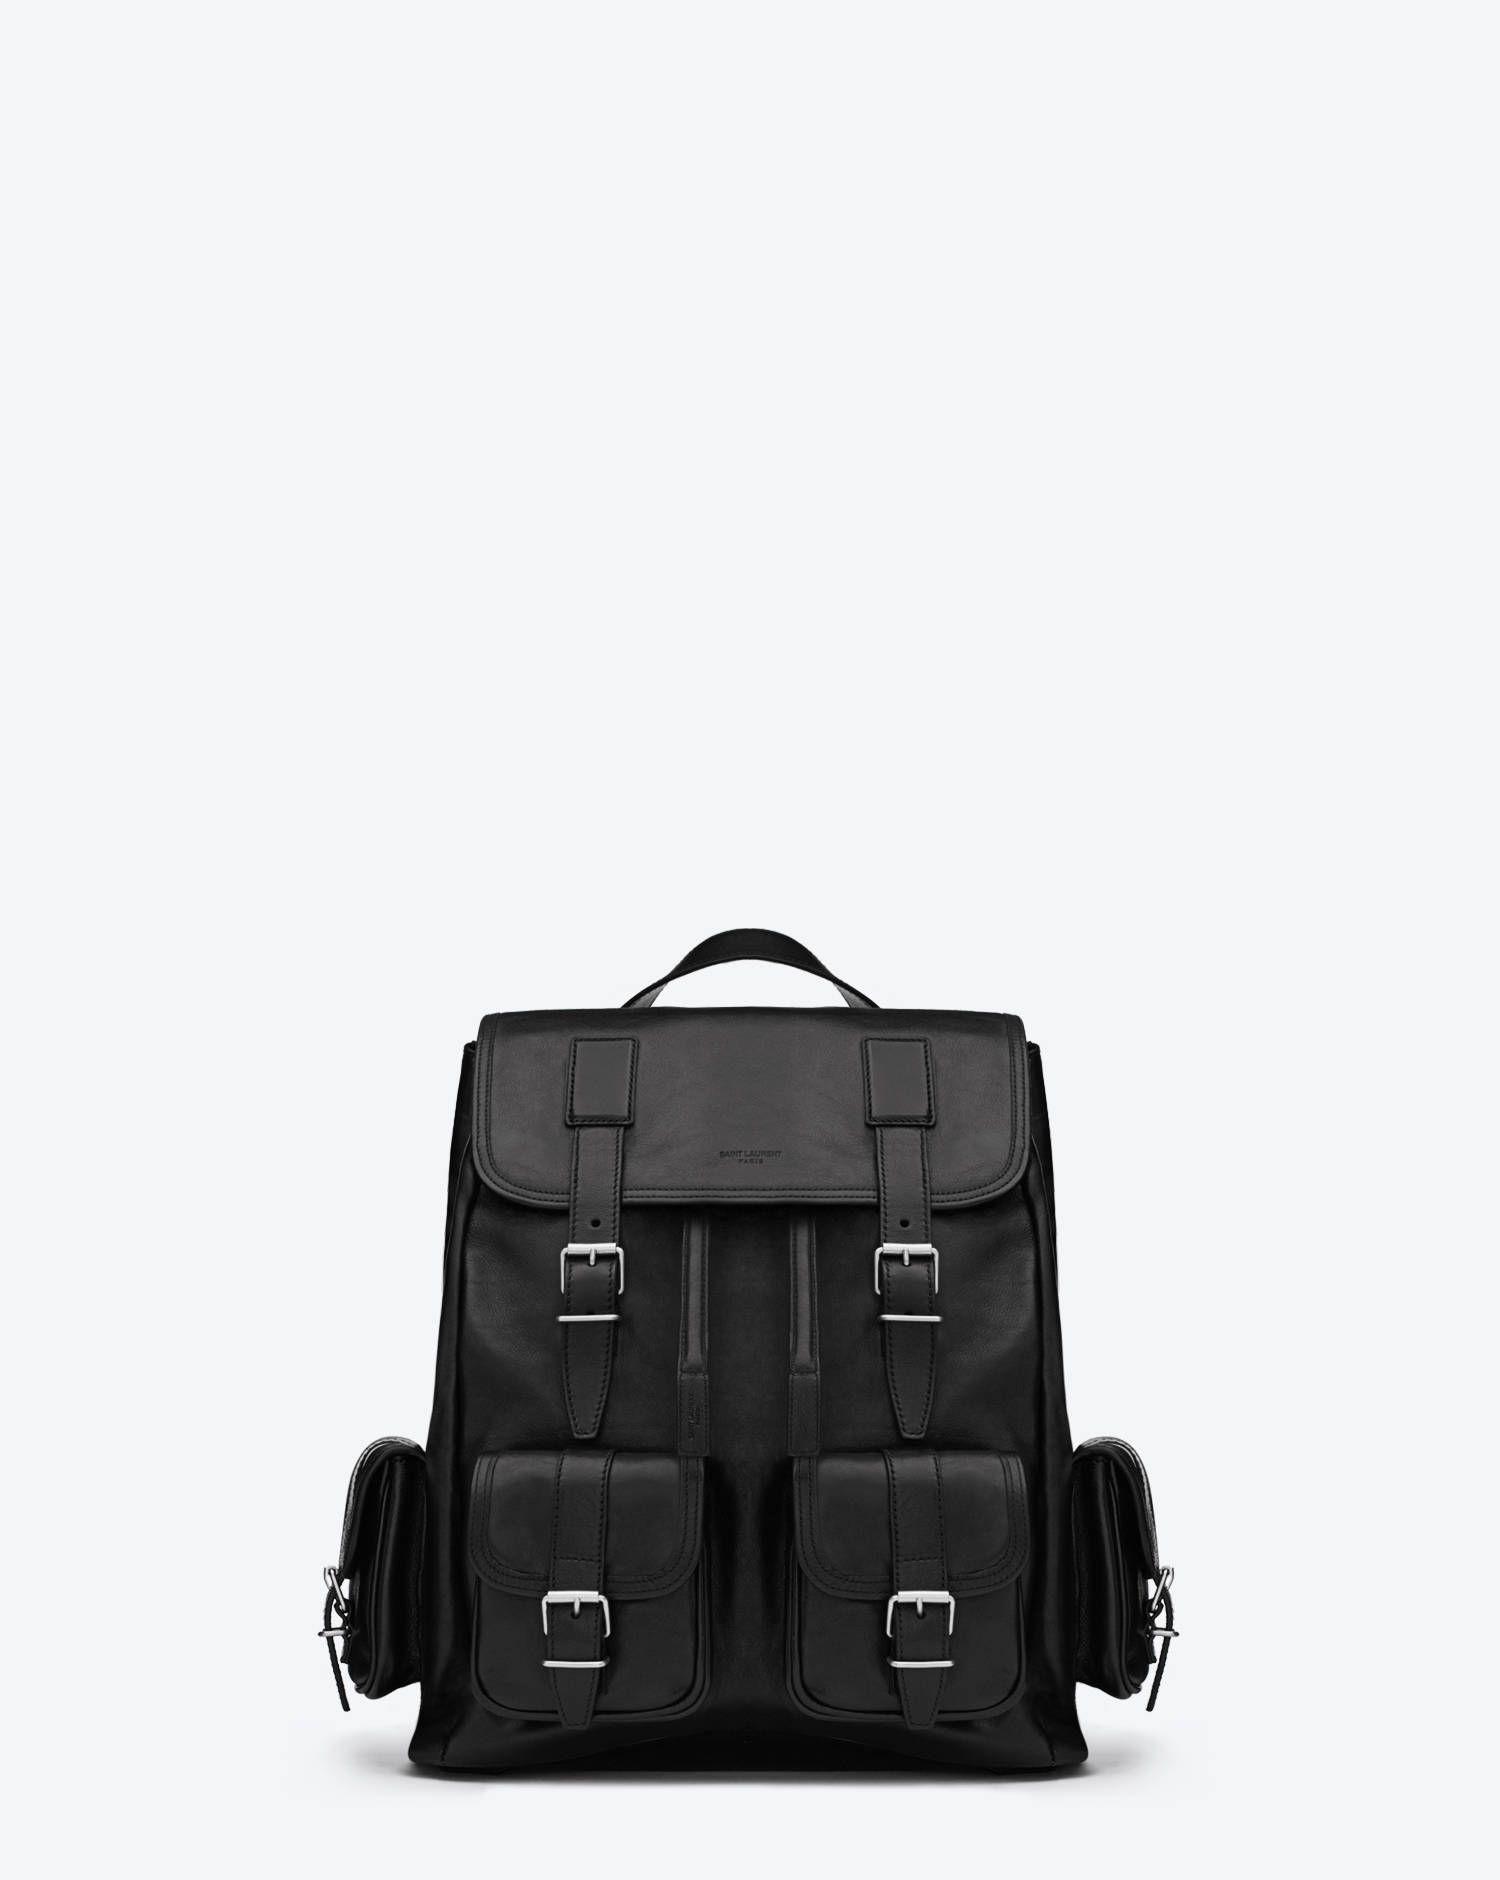 0eb83ce86c9 Rock Sac Backpack in Black Leather - Travel – Bags – Shop Men – Yves Saint  Laurent – www.ysl.eu